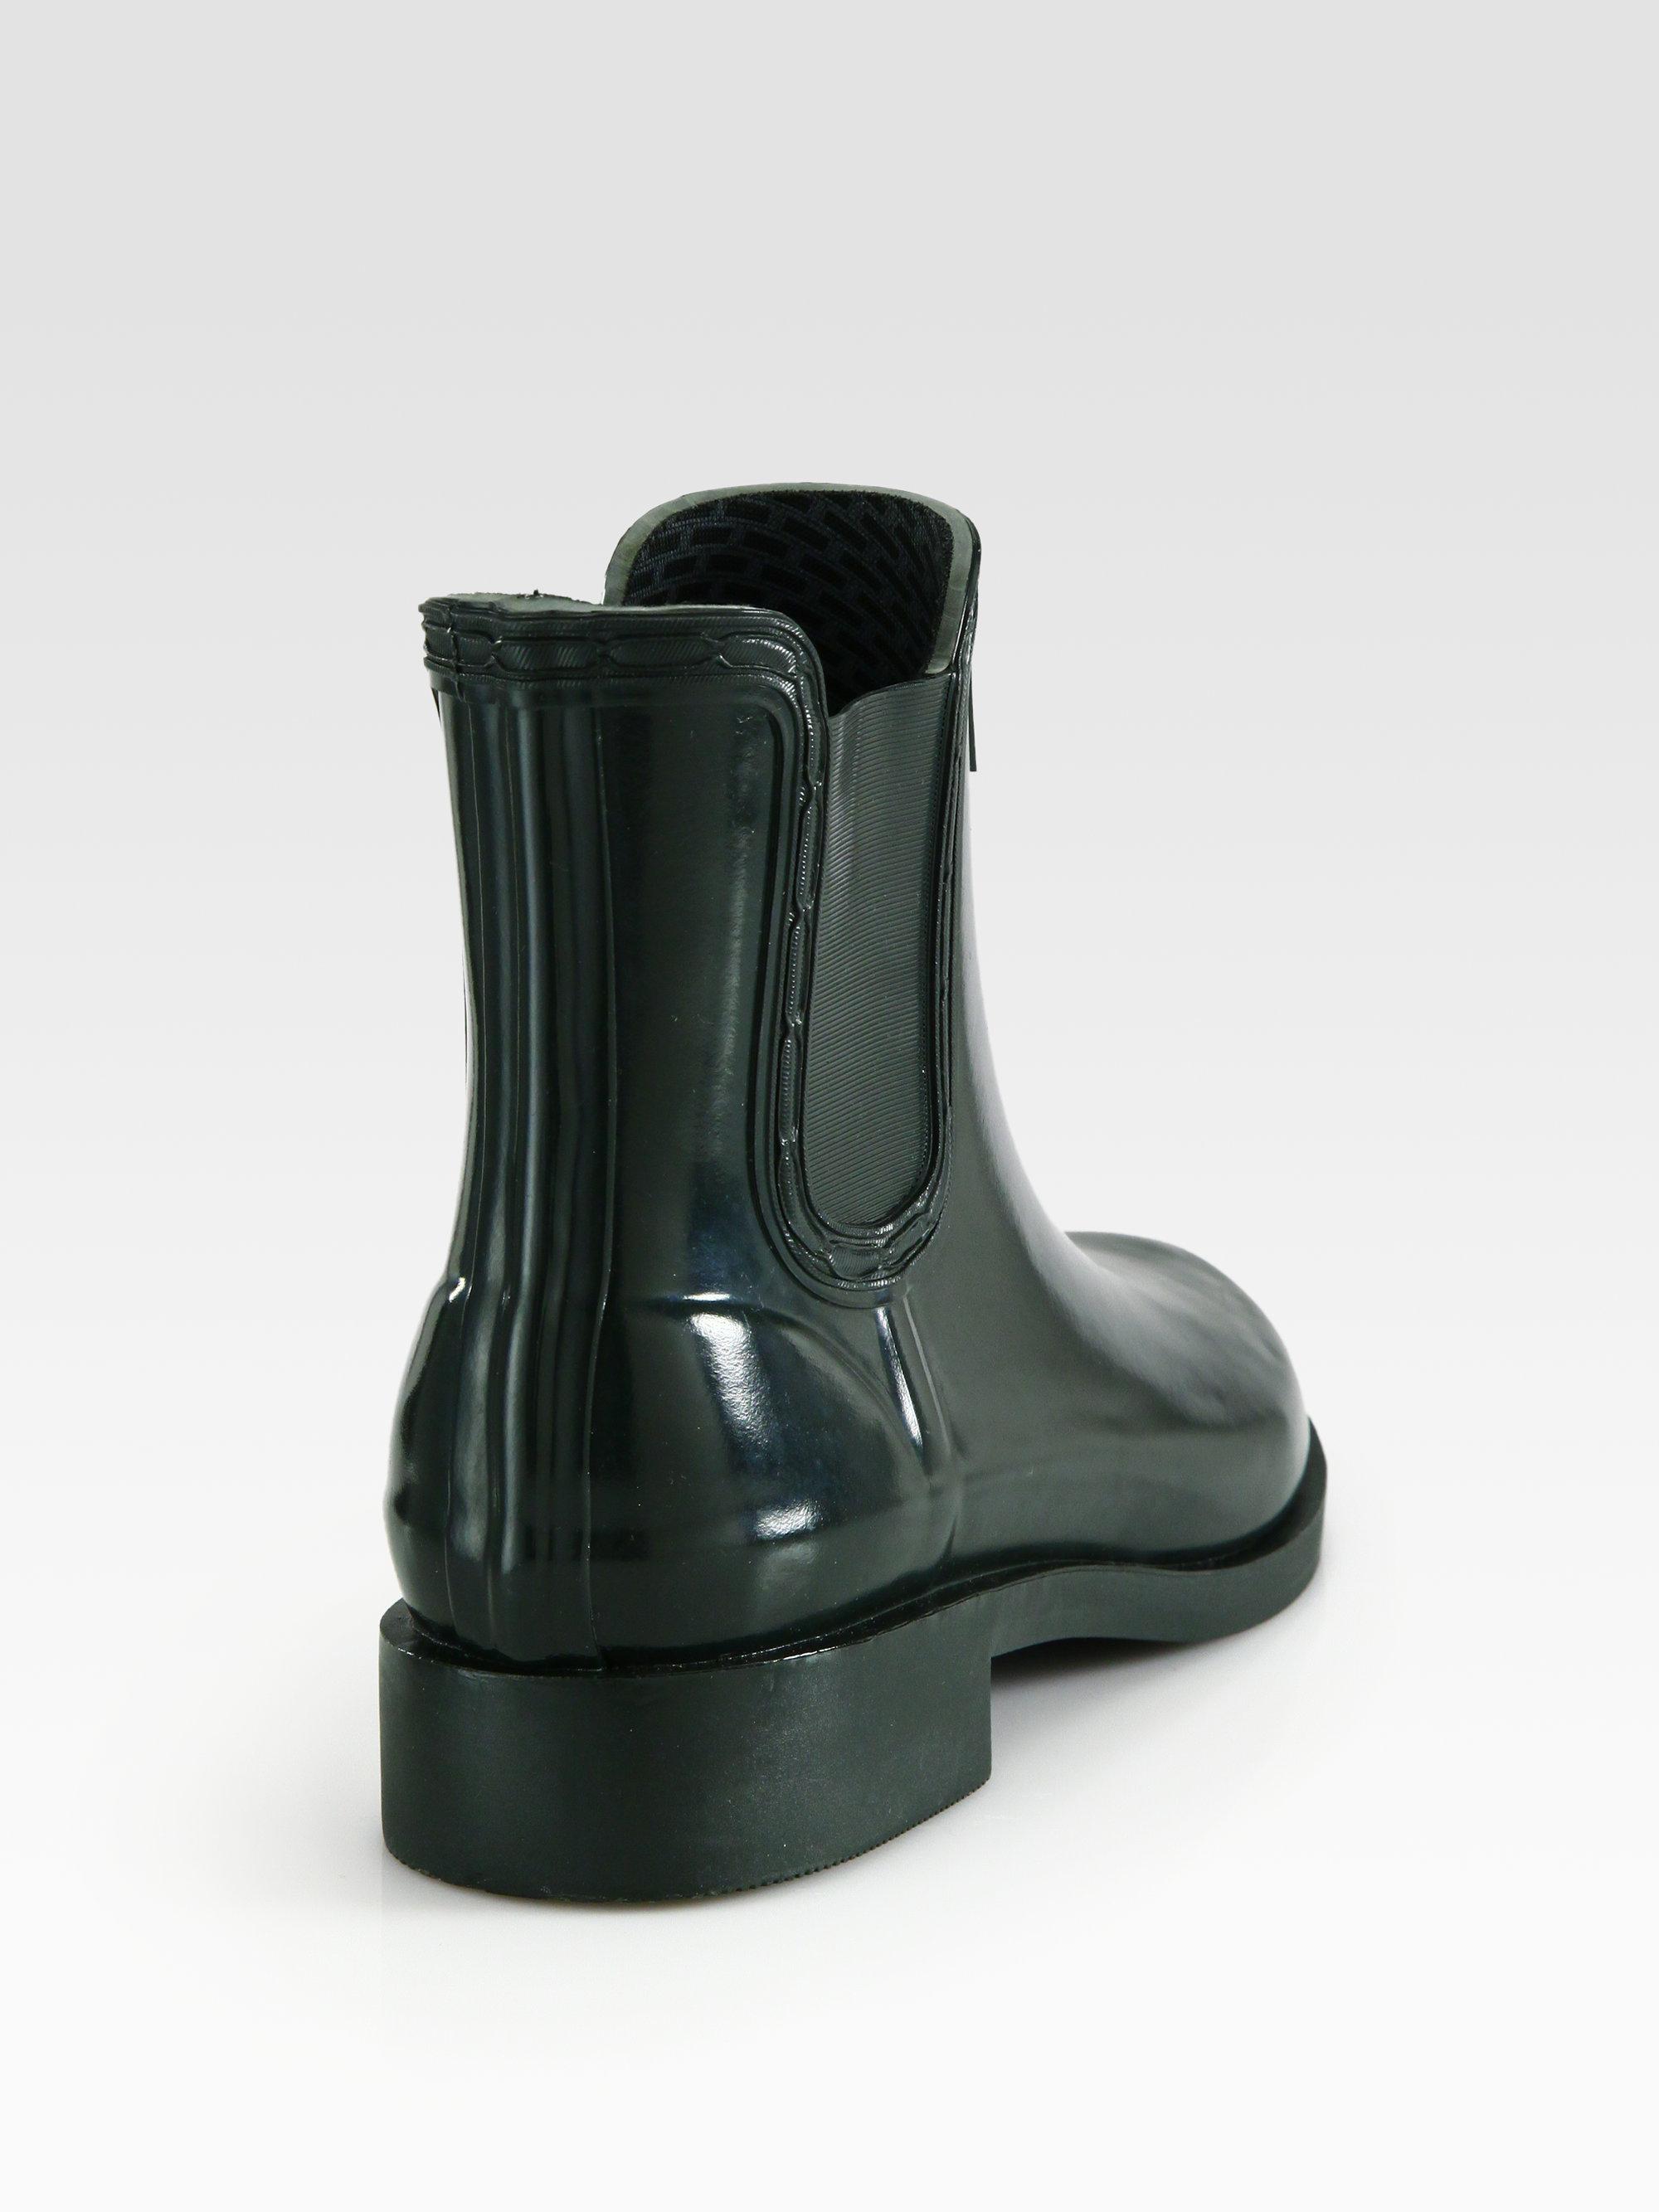 Hunter Short Rubber Rain Boots in Black | Lyst